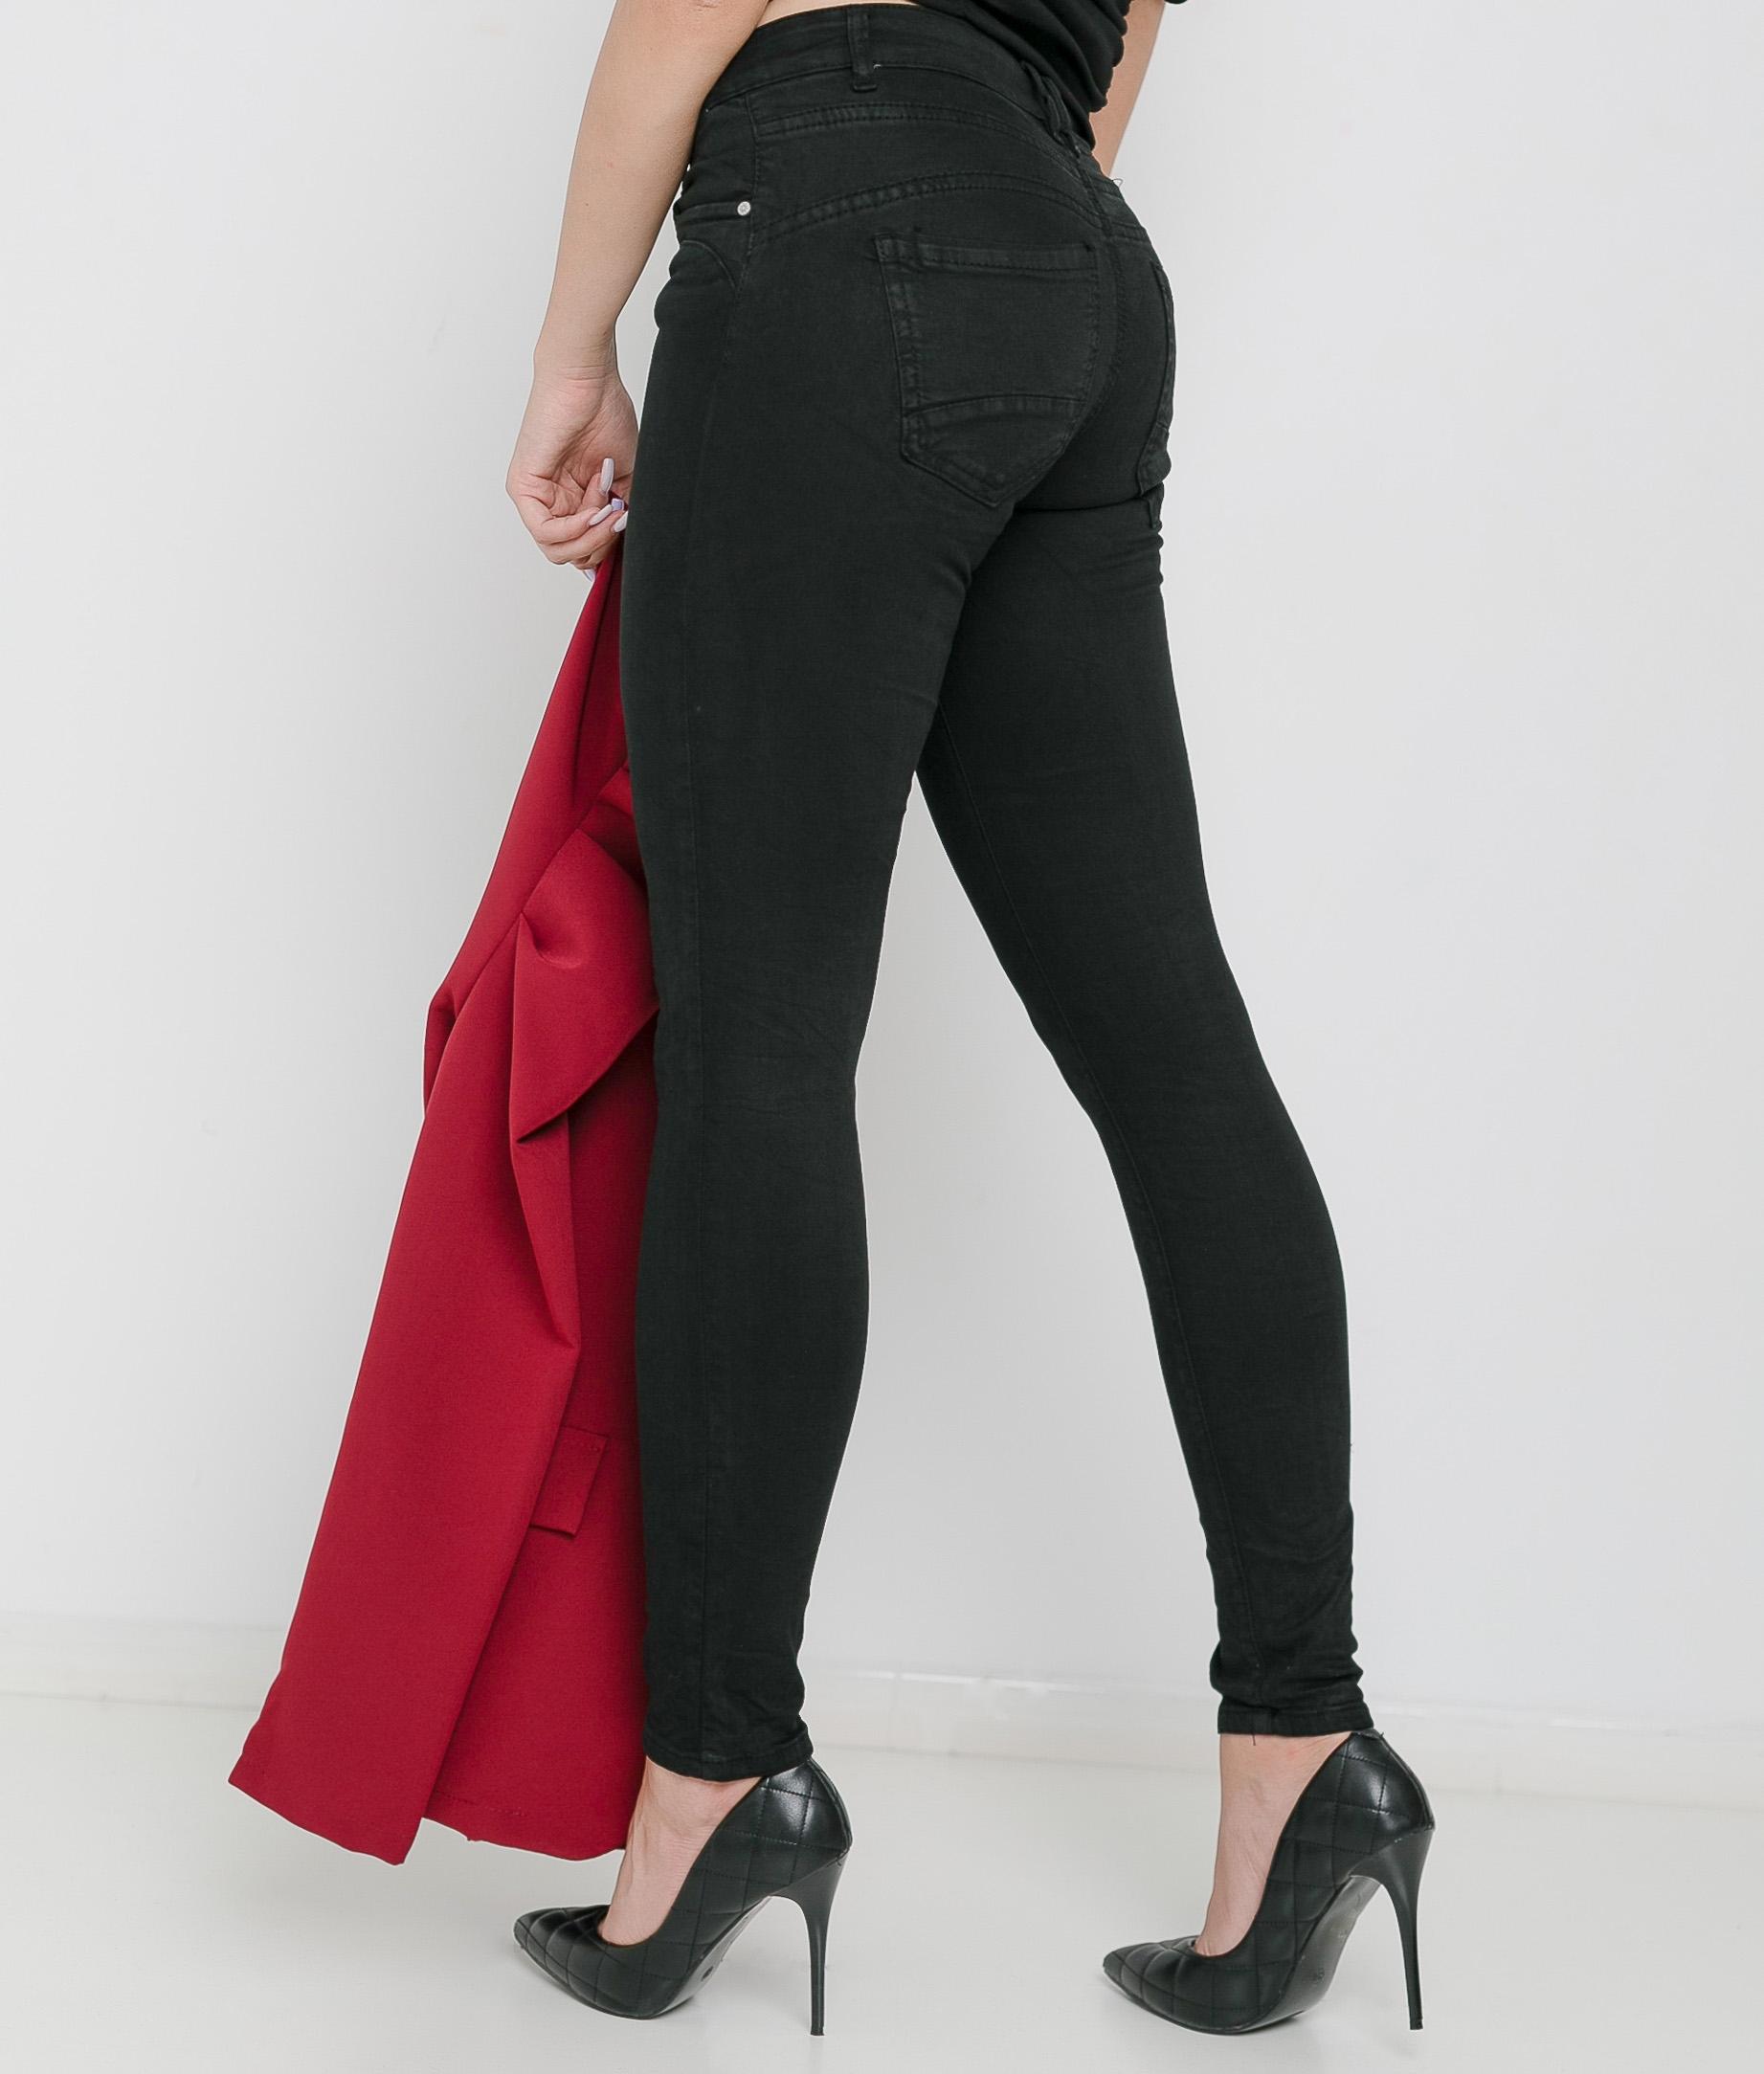 Pantalón Mainer - Negro